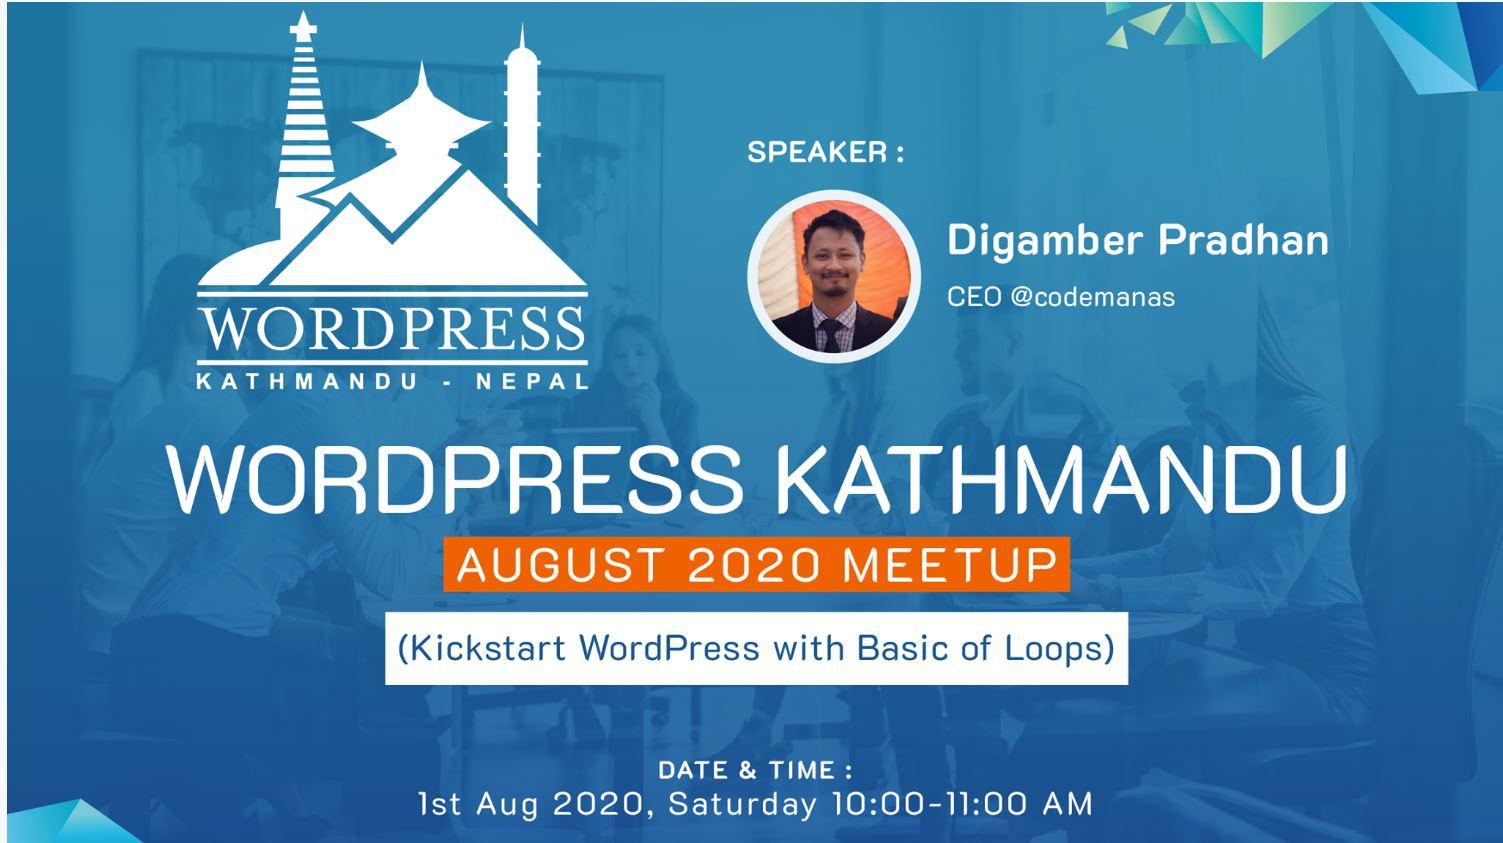 WordPress Kathmandu Event